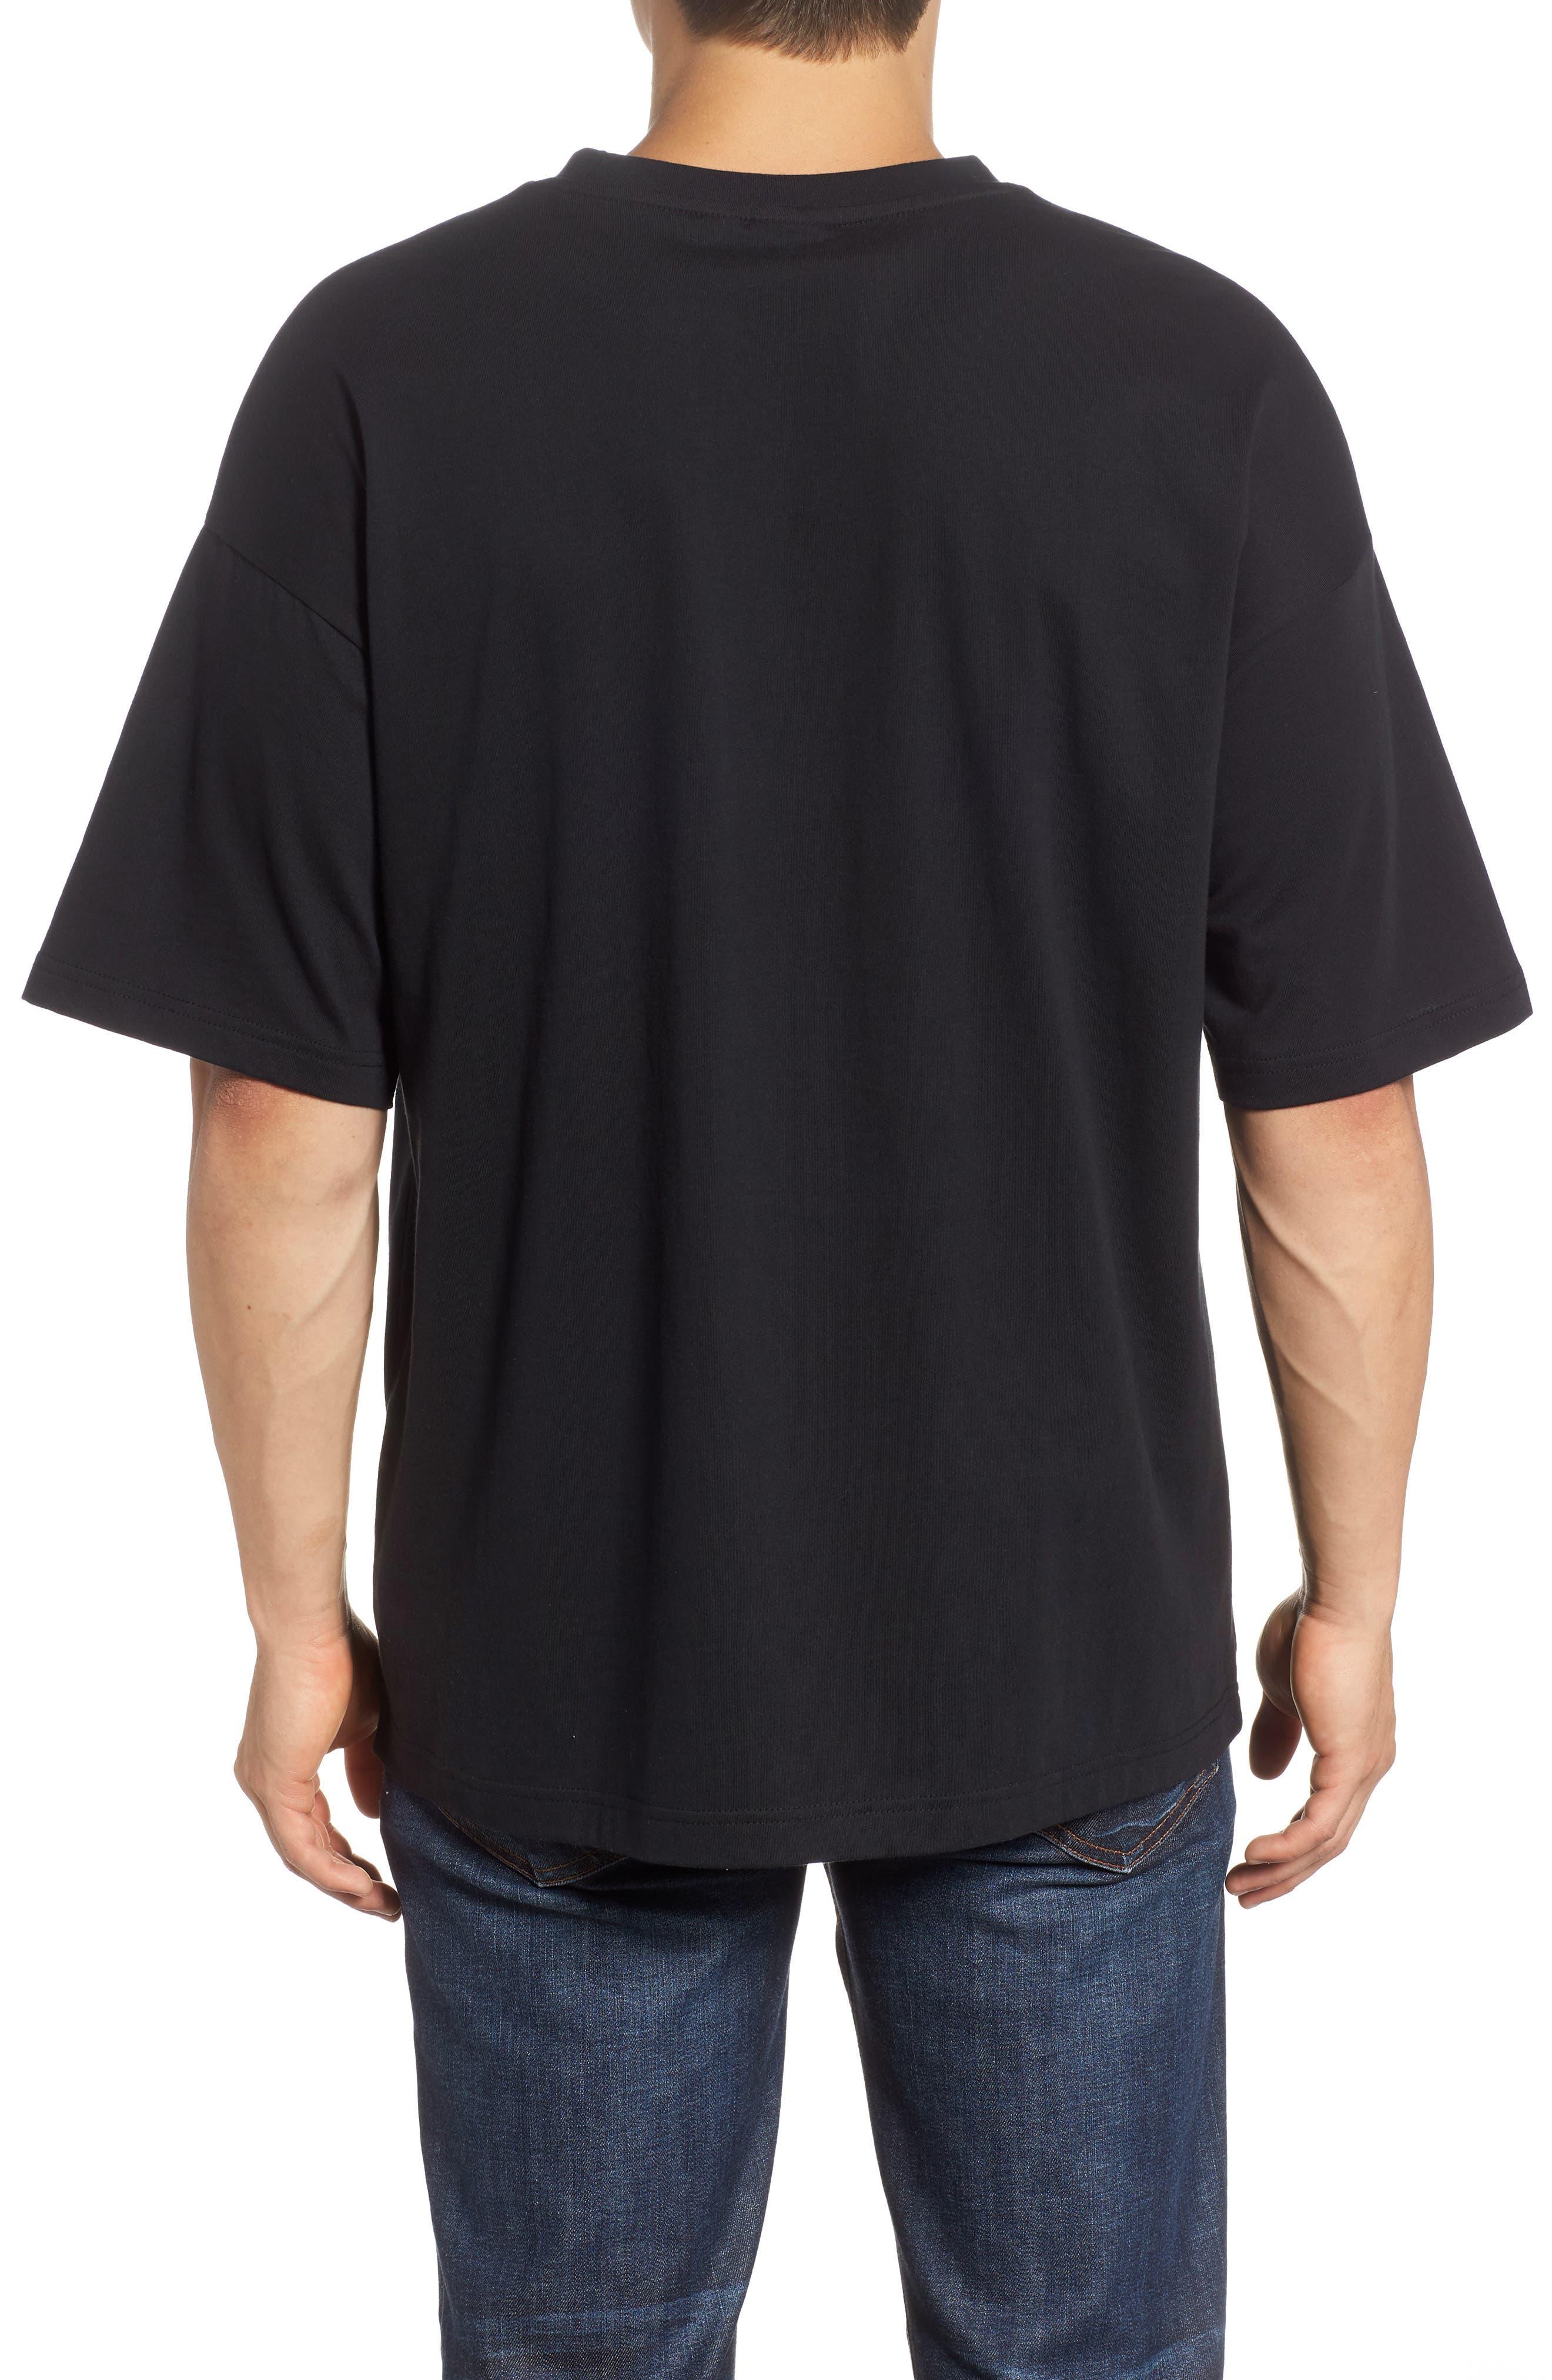 Chains T-Shirt,                             Alternate thumbnail 2, color,                             Puma Black/ Gold